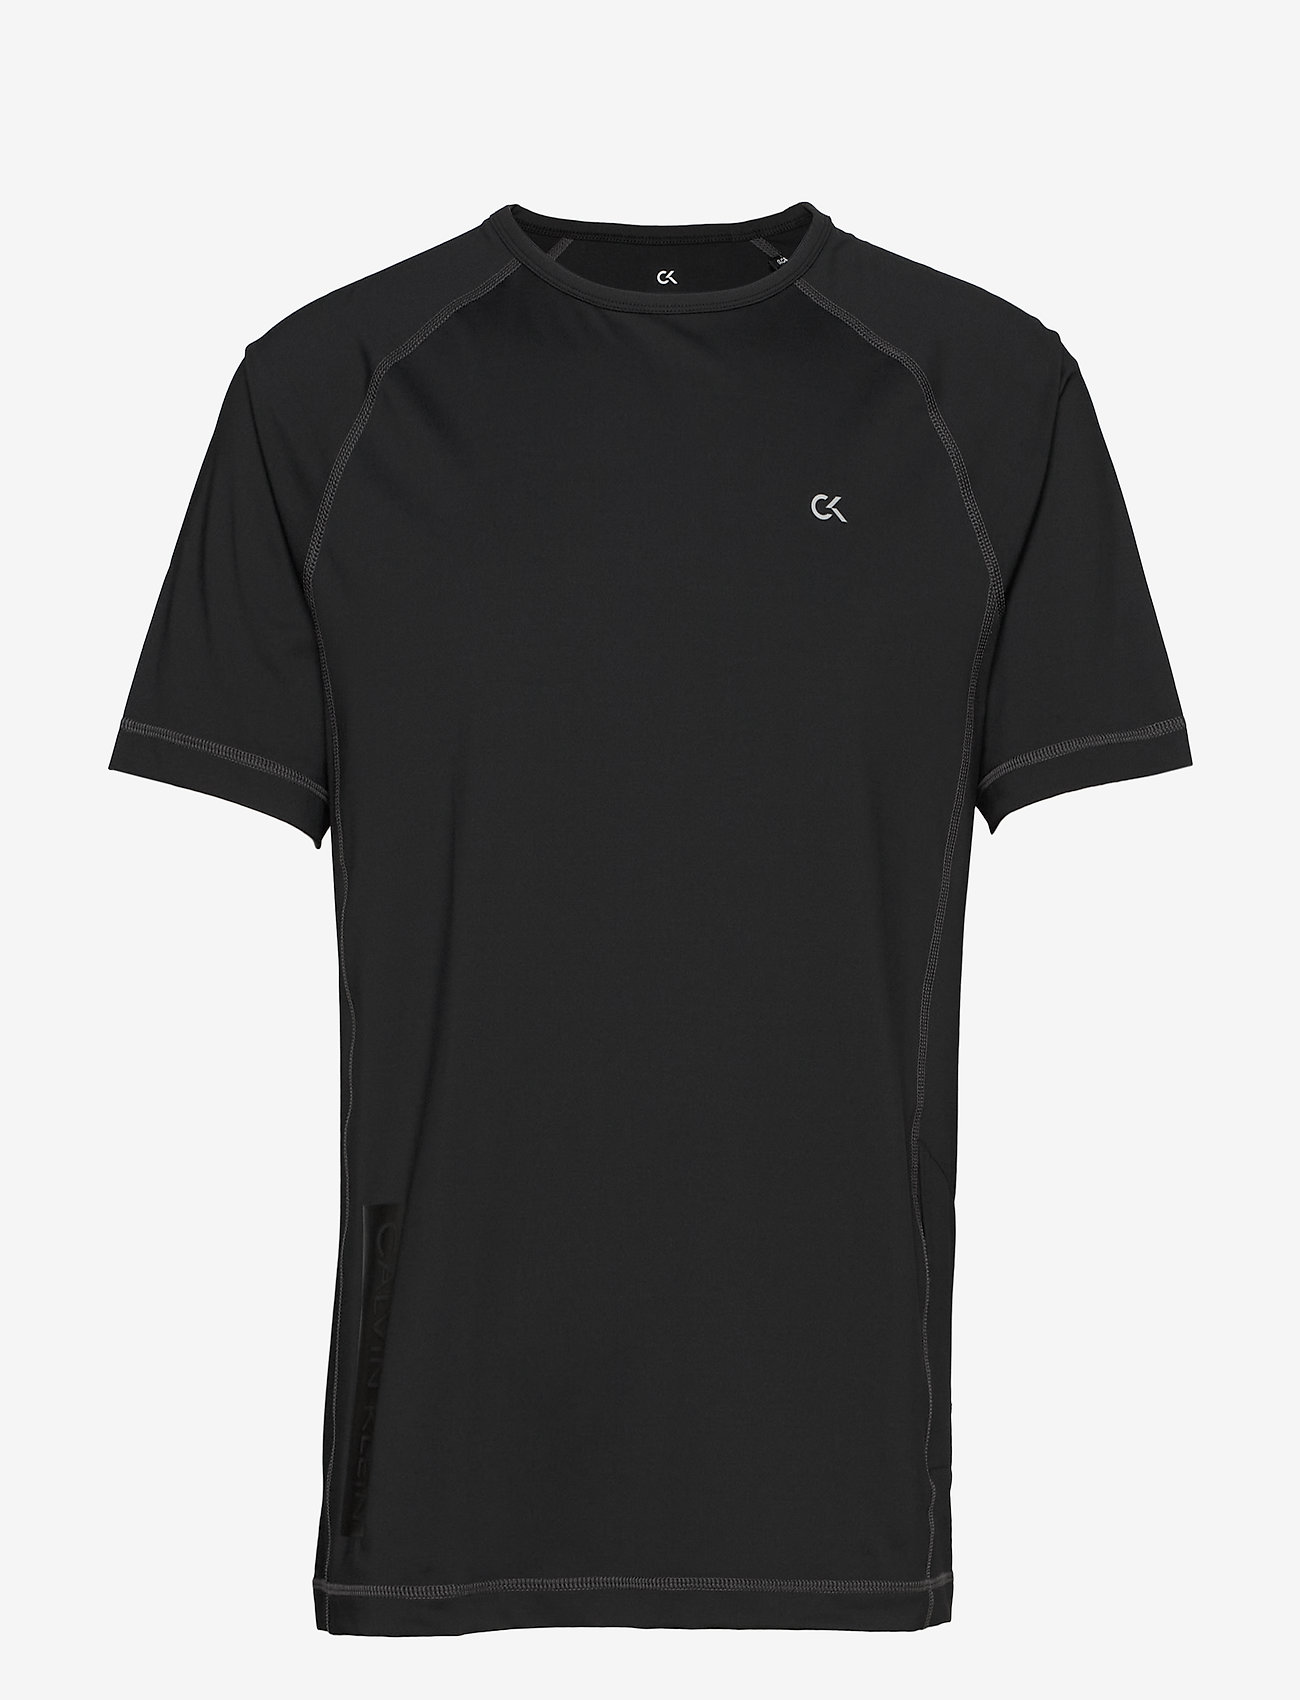 Calvin Klein Performance - SHORT SLEEVE T-SHIRT - t-shirts - ck black/ck black/ck black - 0